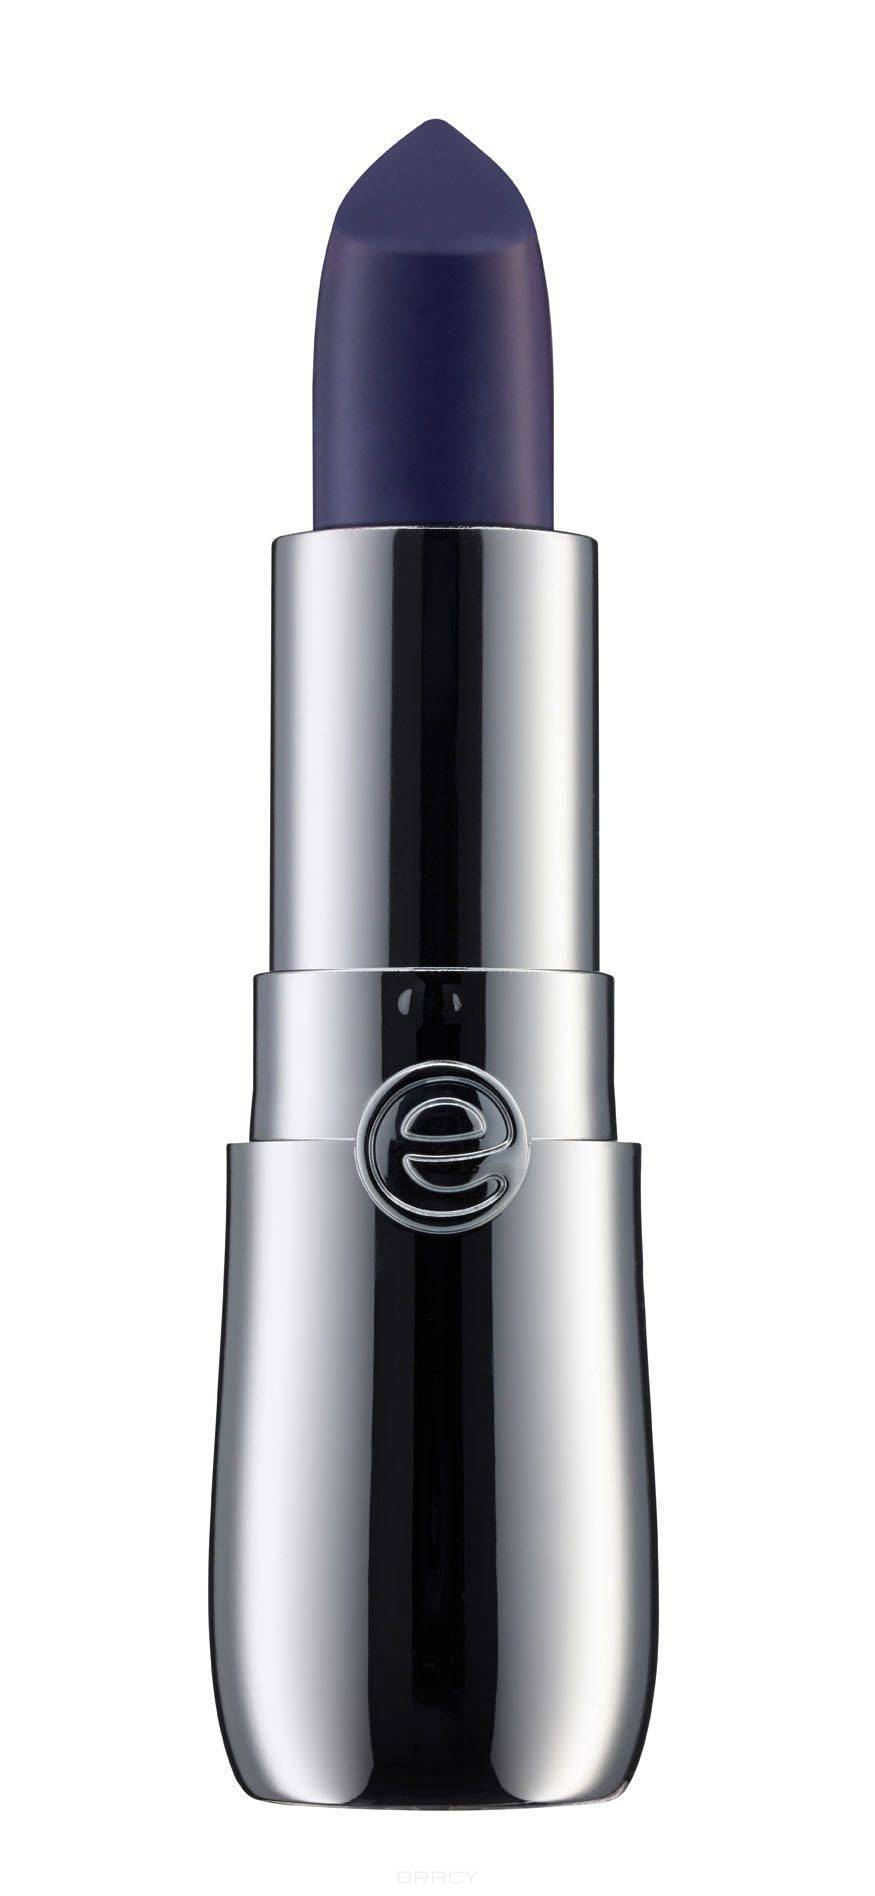 все цены на Essence, Сияющая губная помада Colour Up! Shine On! Lipstick, 3.5 гр (12 тонов) №14, пурпурно-синий онлайн